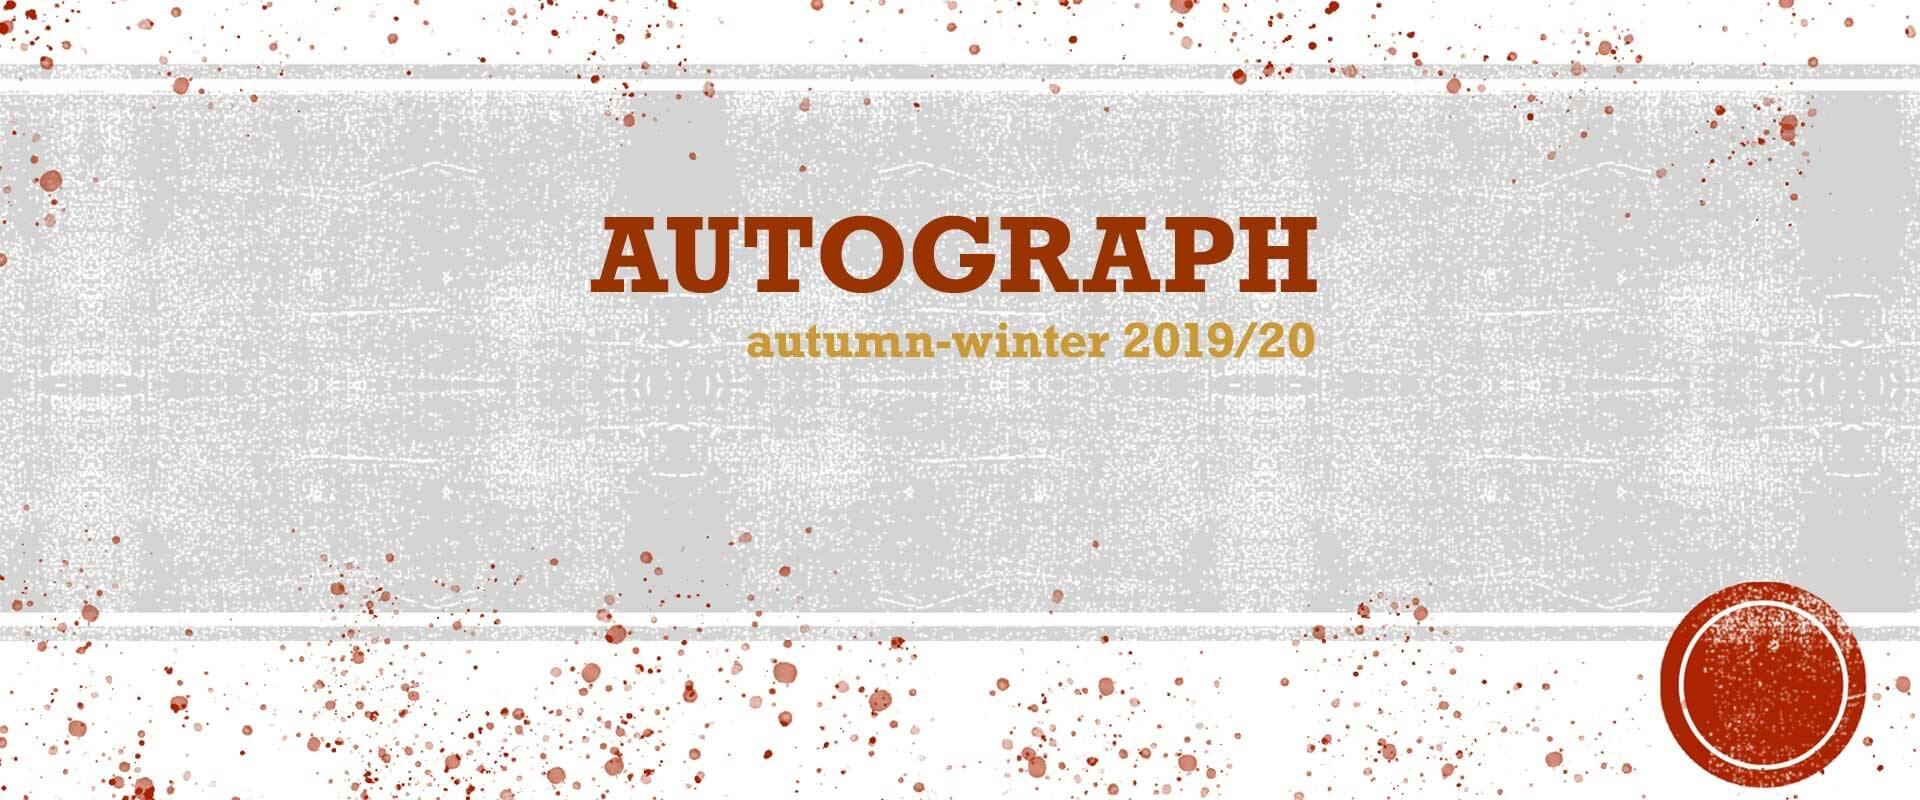 autumn-winter collection 19-20